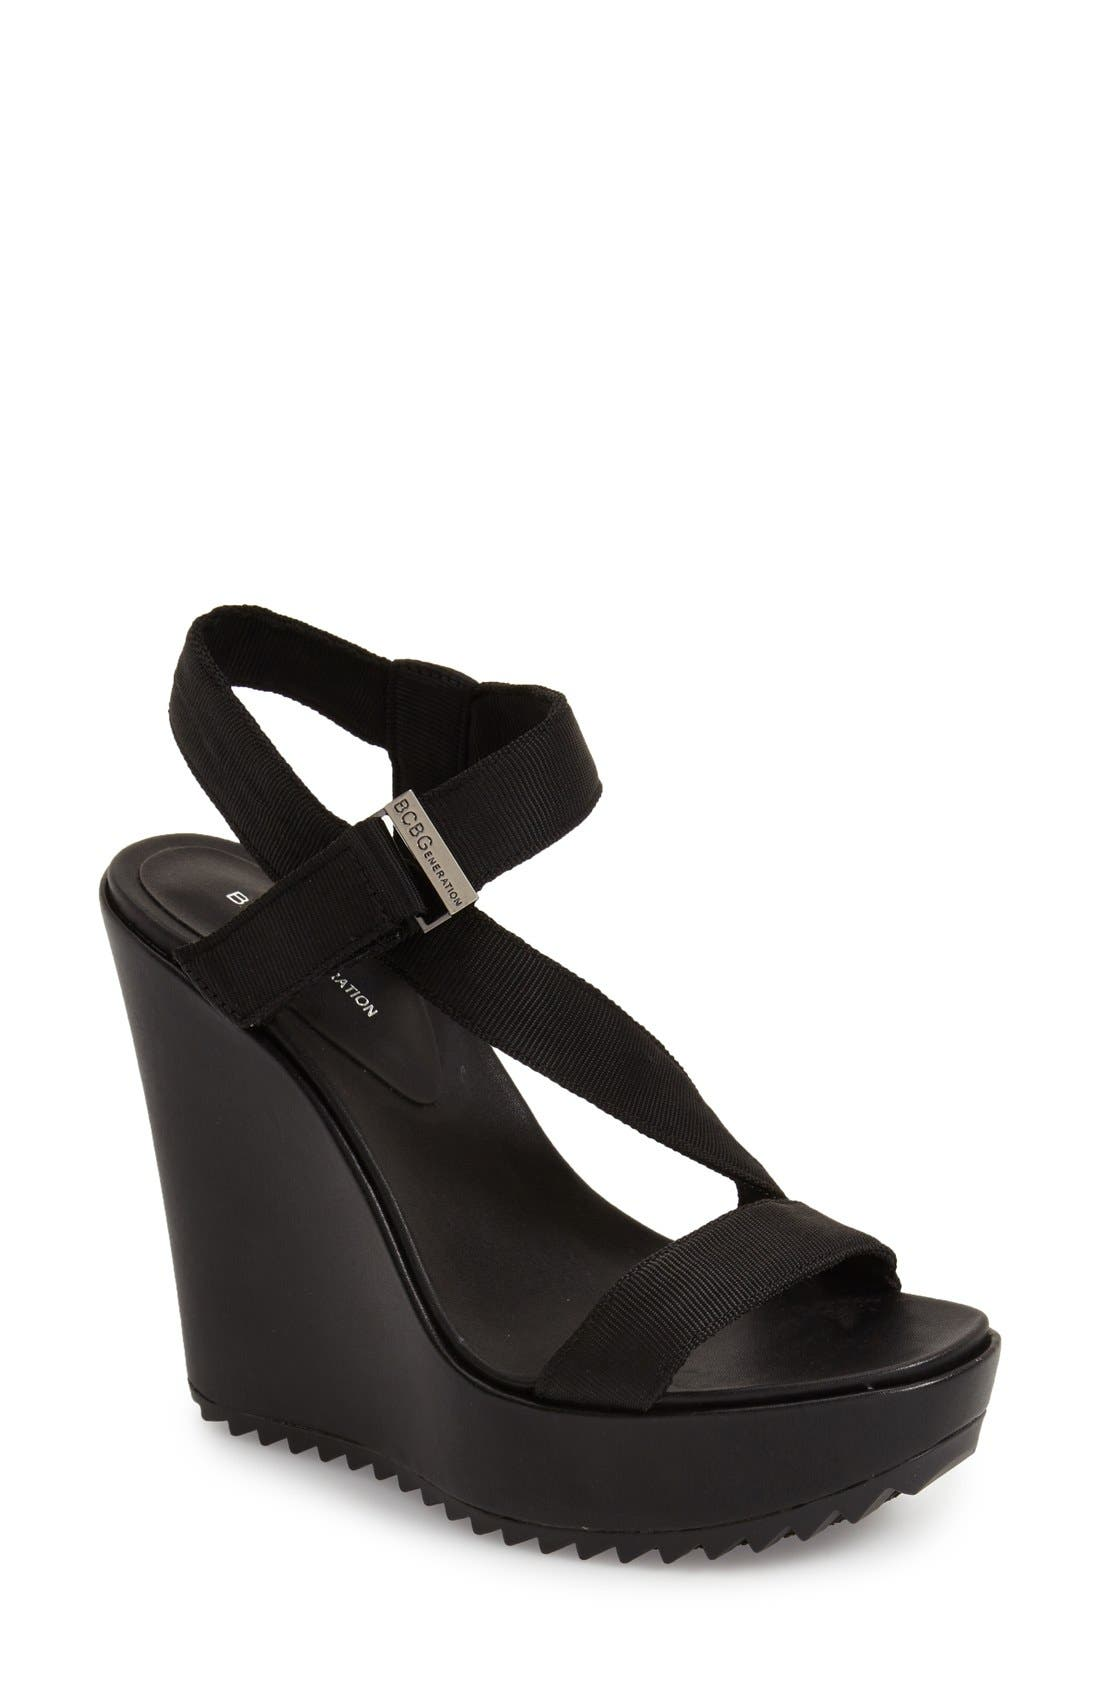 Main Image - BCBGeneration 'Carille' Wedge Sandal (Women)